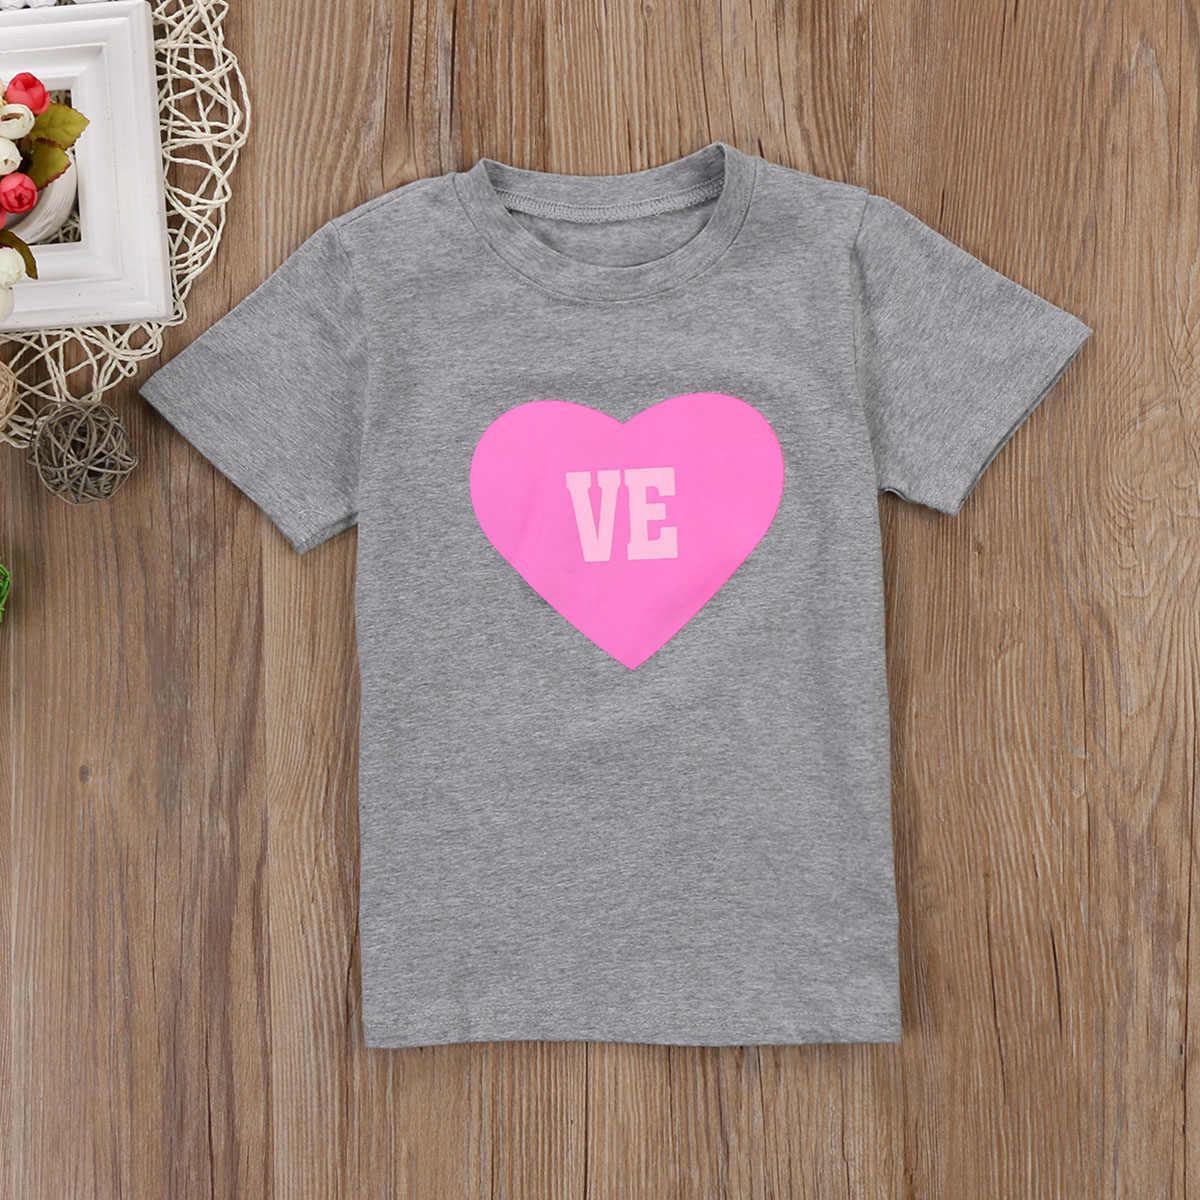 2018 mamá hija bebé niñas familia juego corazón encantador gris camiseta Top ropa de verano